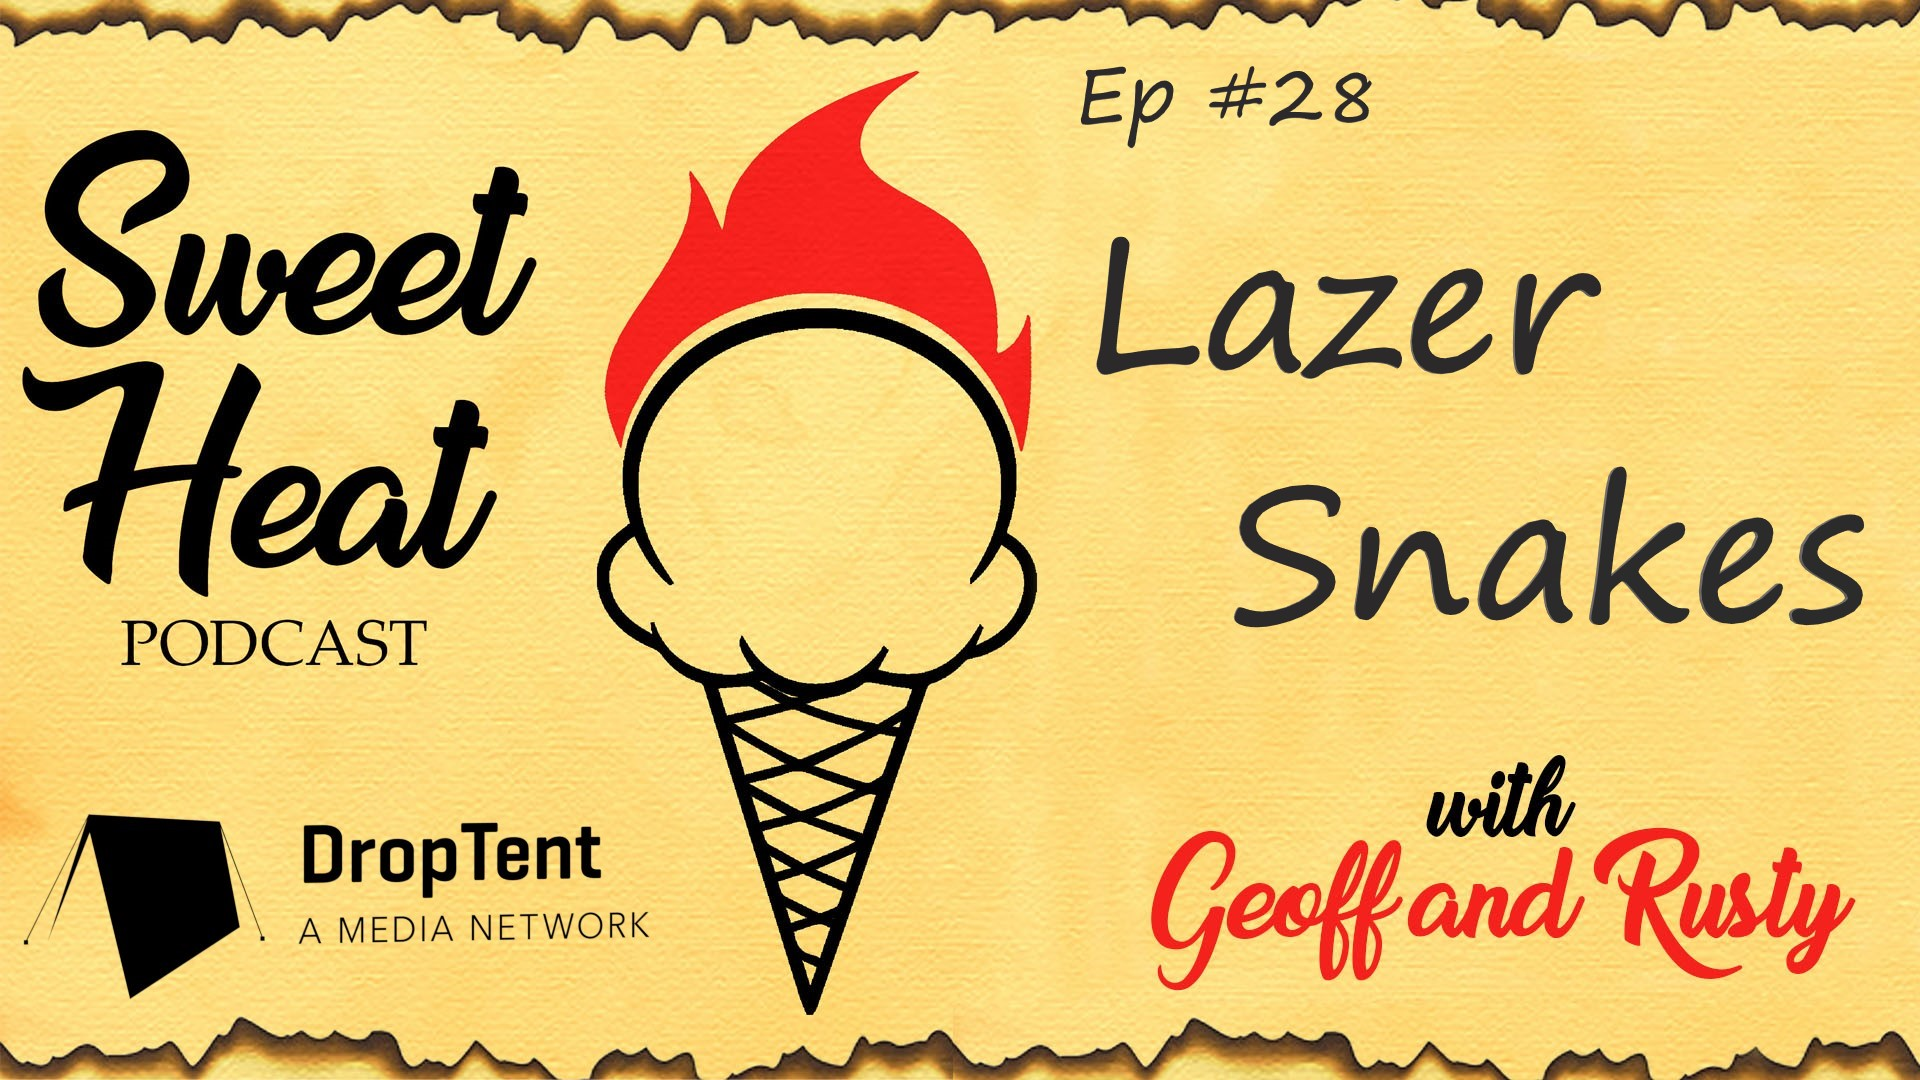 Lazer Snakes - Ep 28 show art